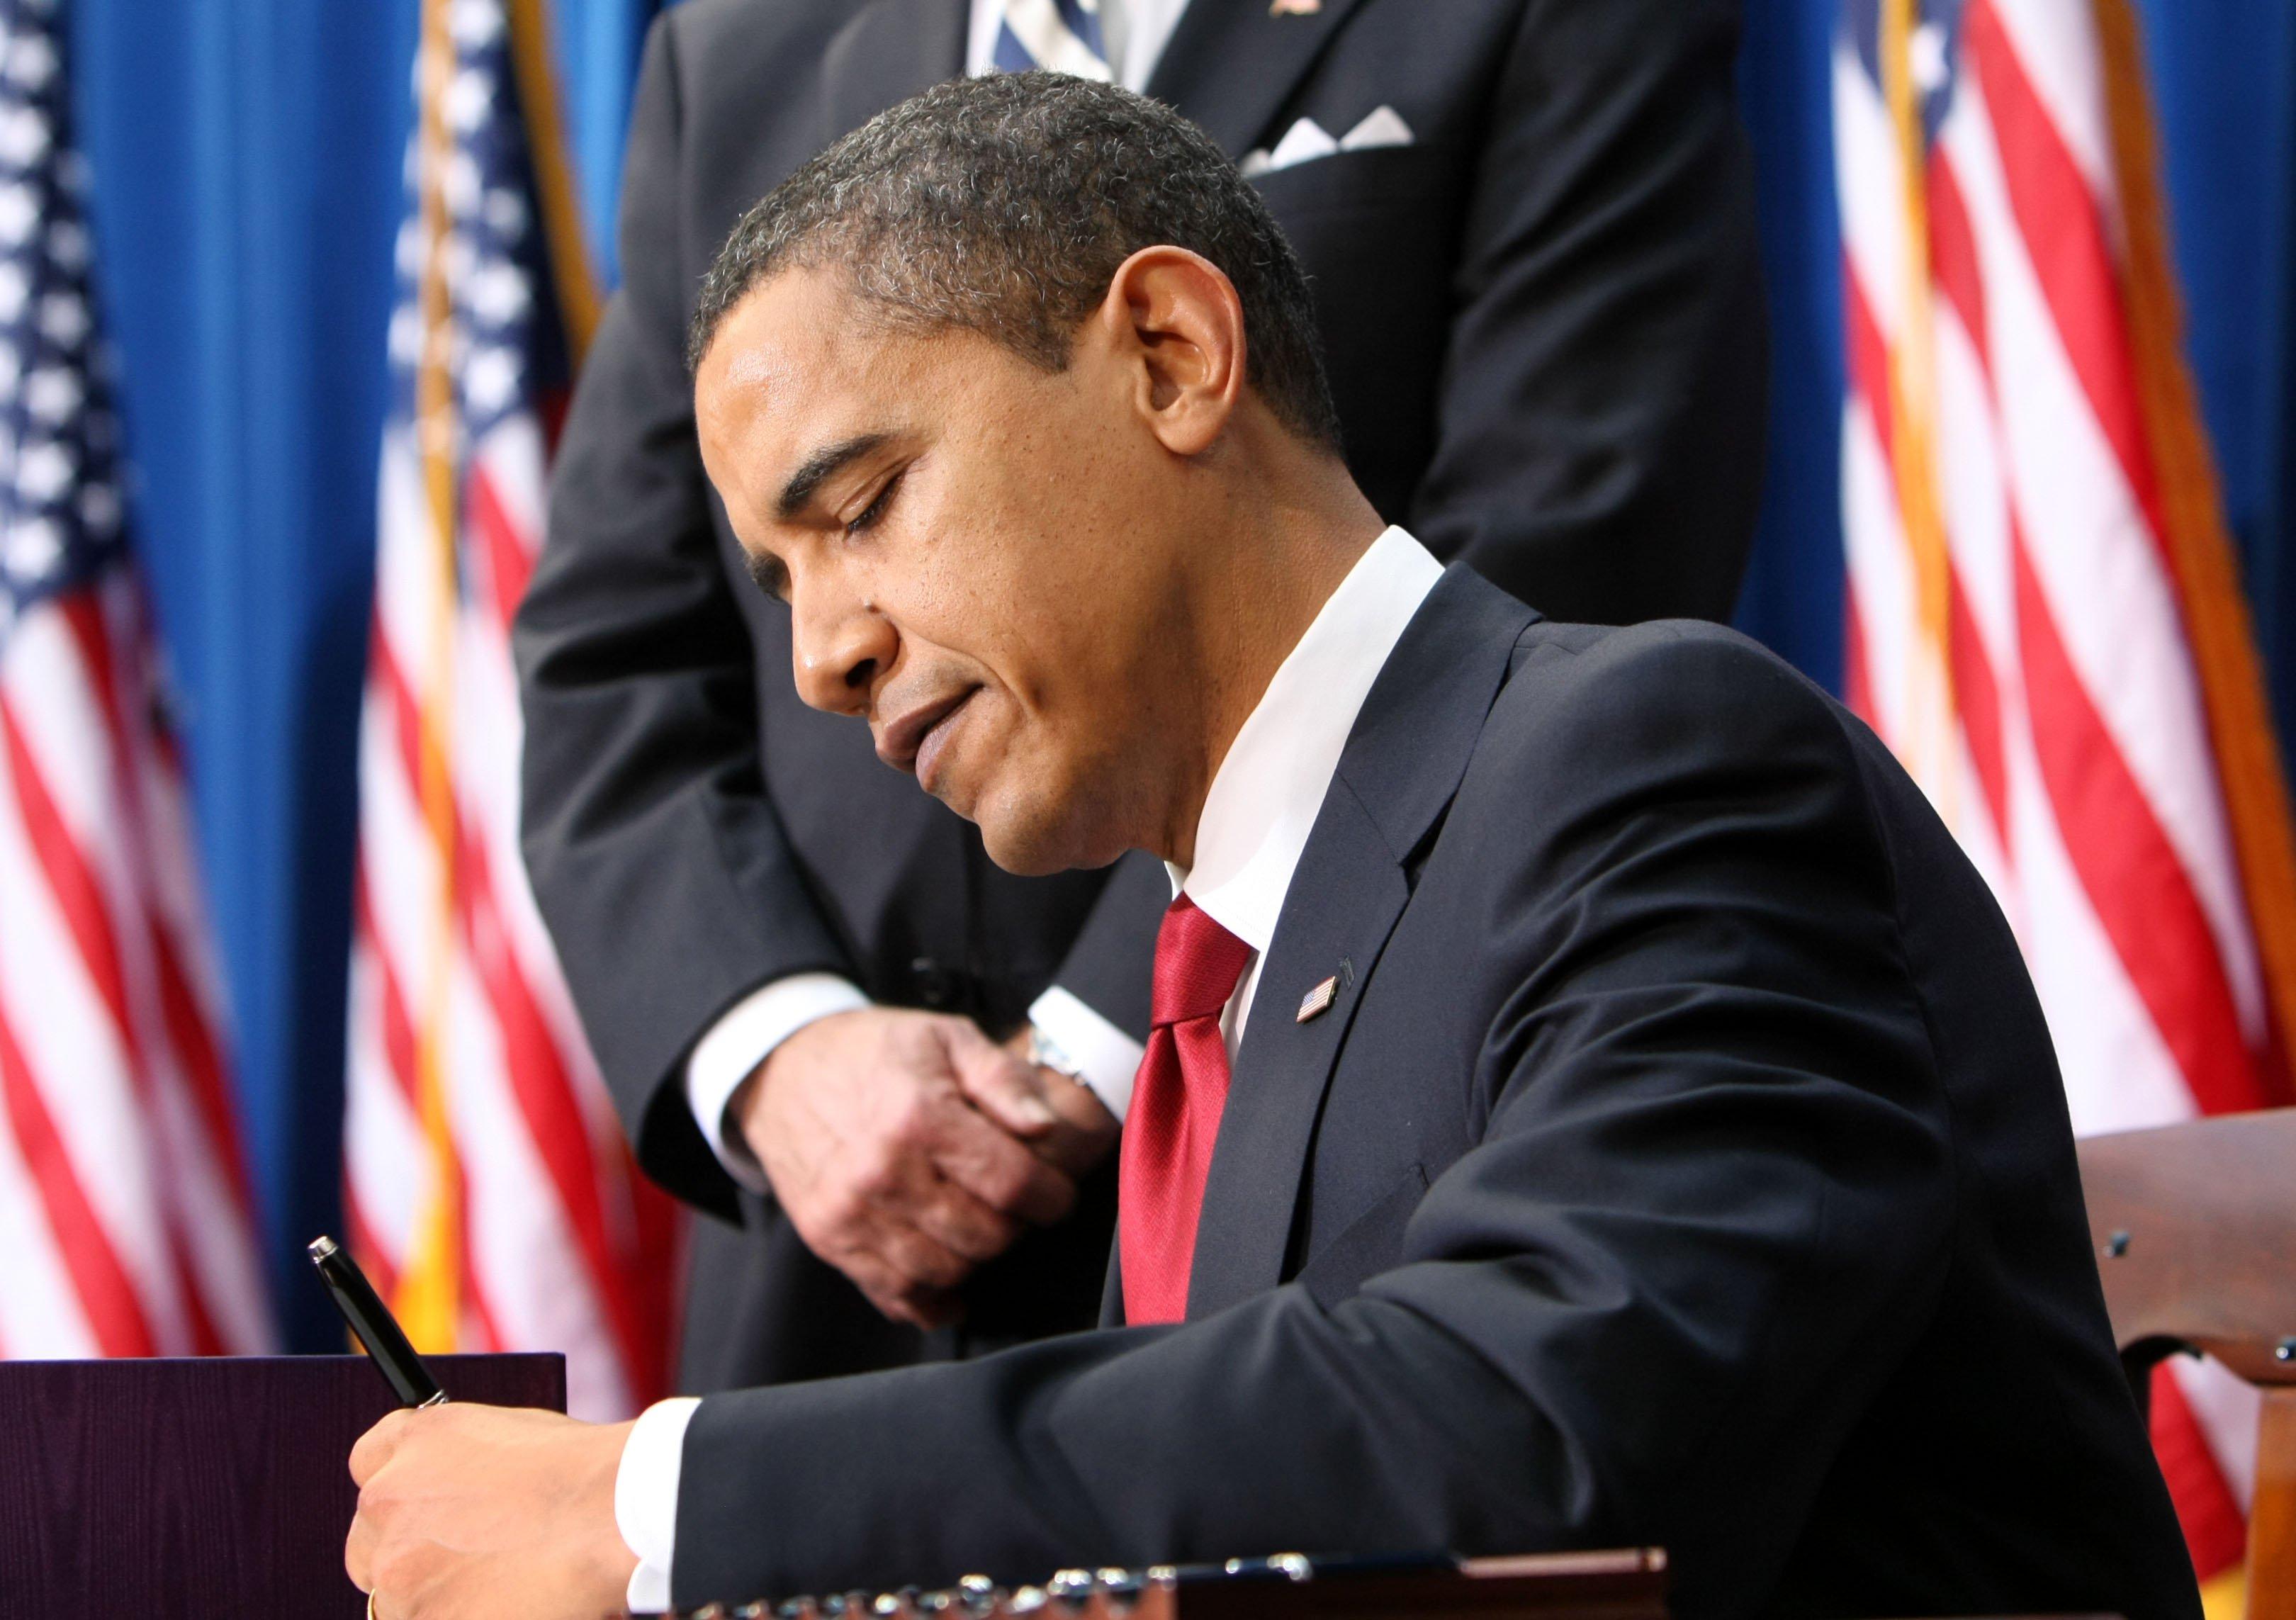 Obama signing a bill